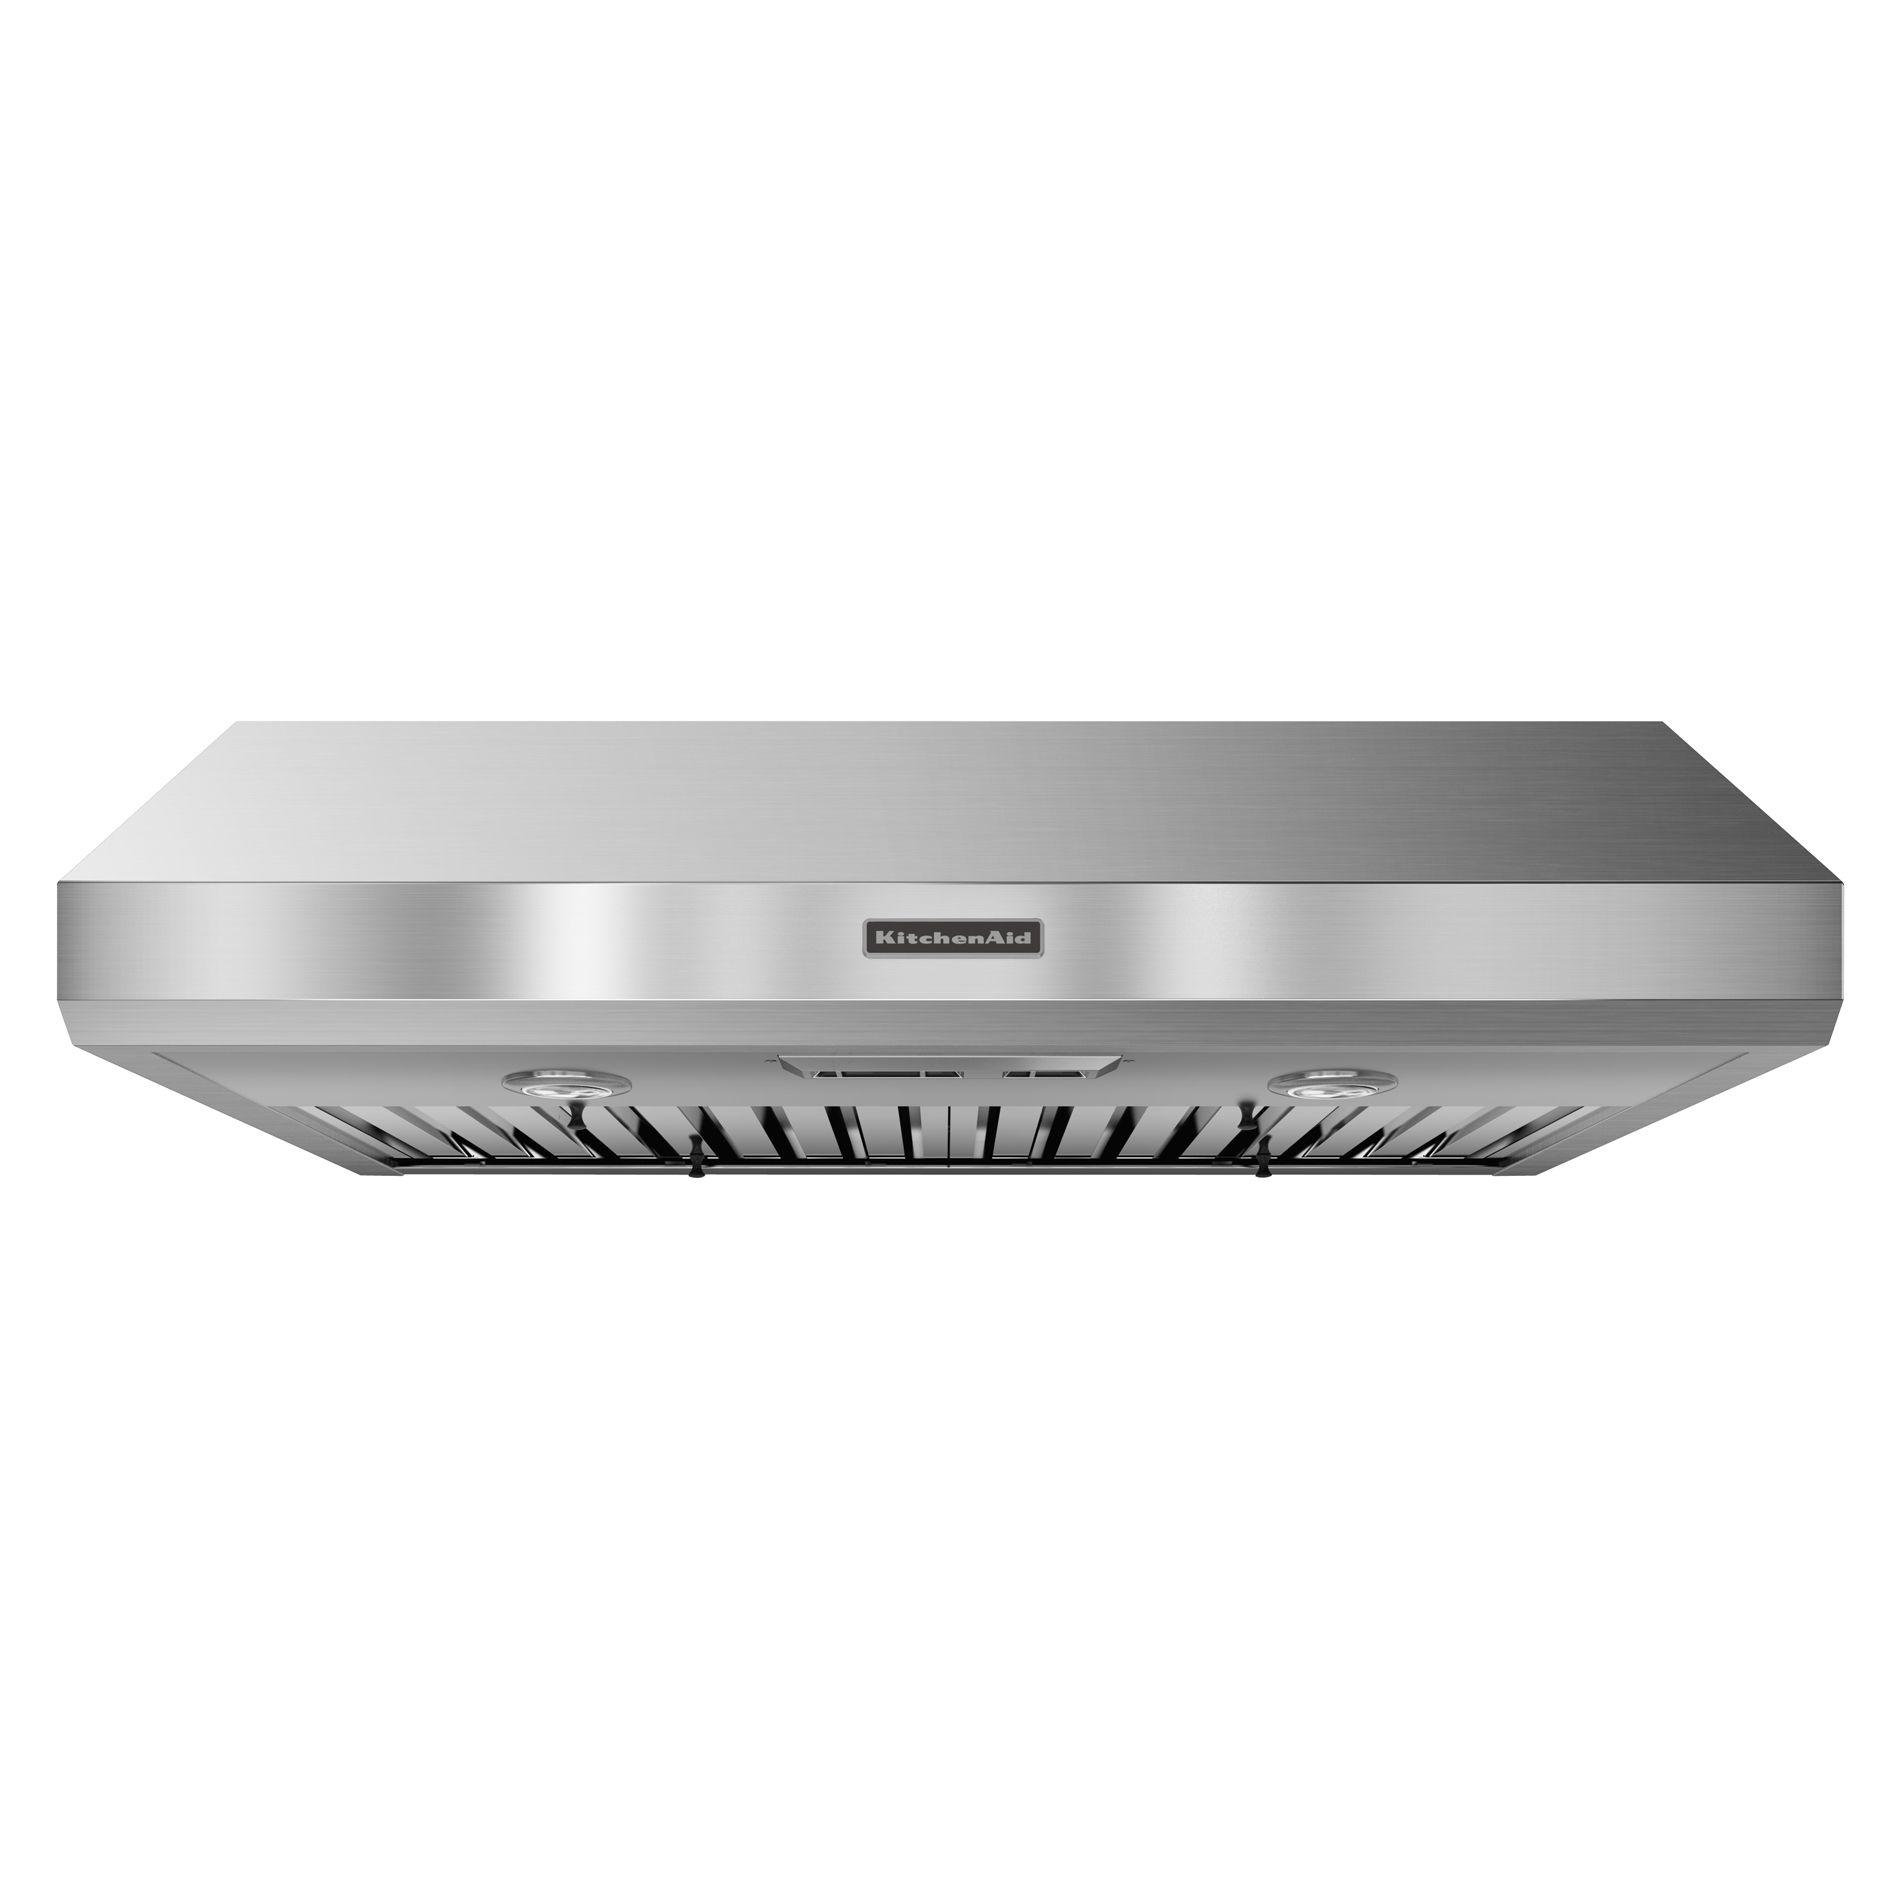 KitchenAid KXU8036YSS 36